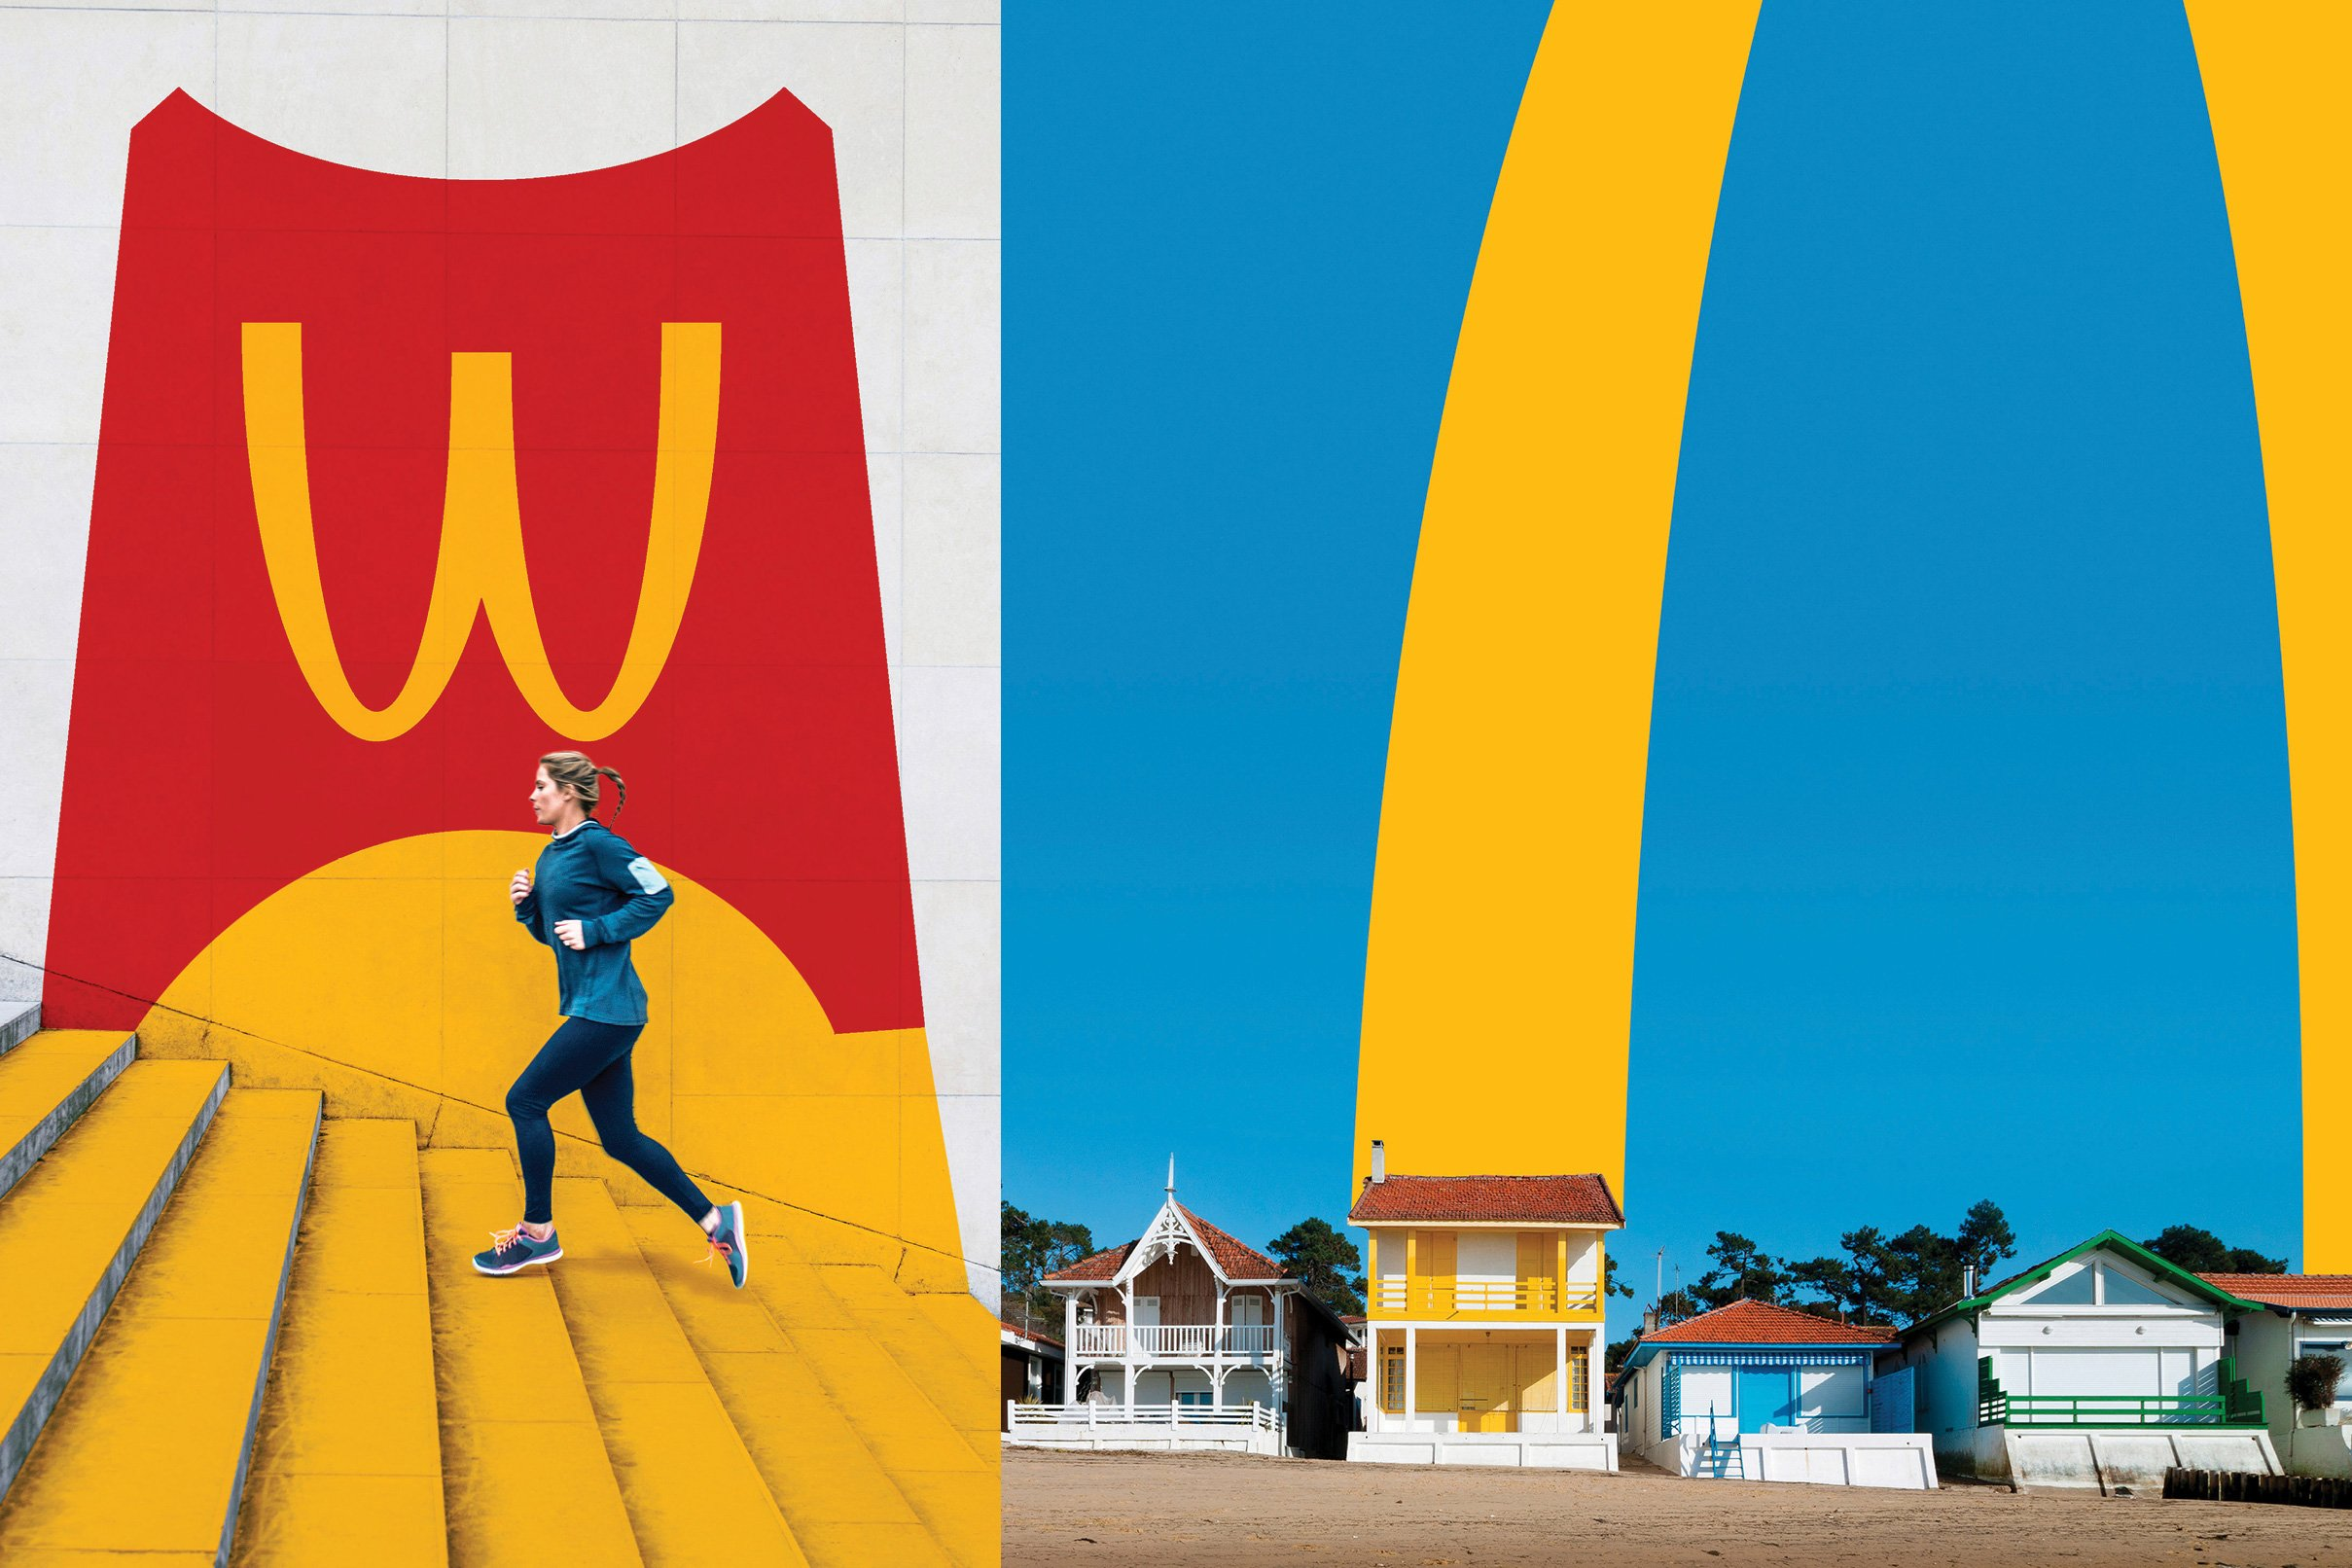 McDonald's serves up a new visual identity